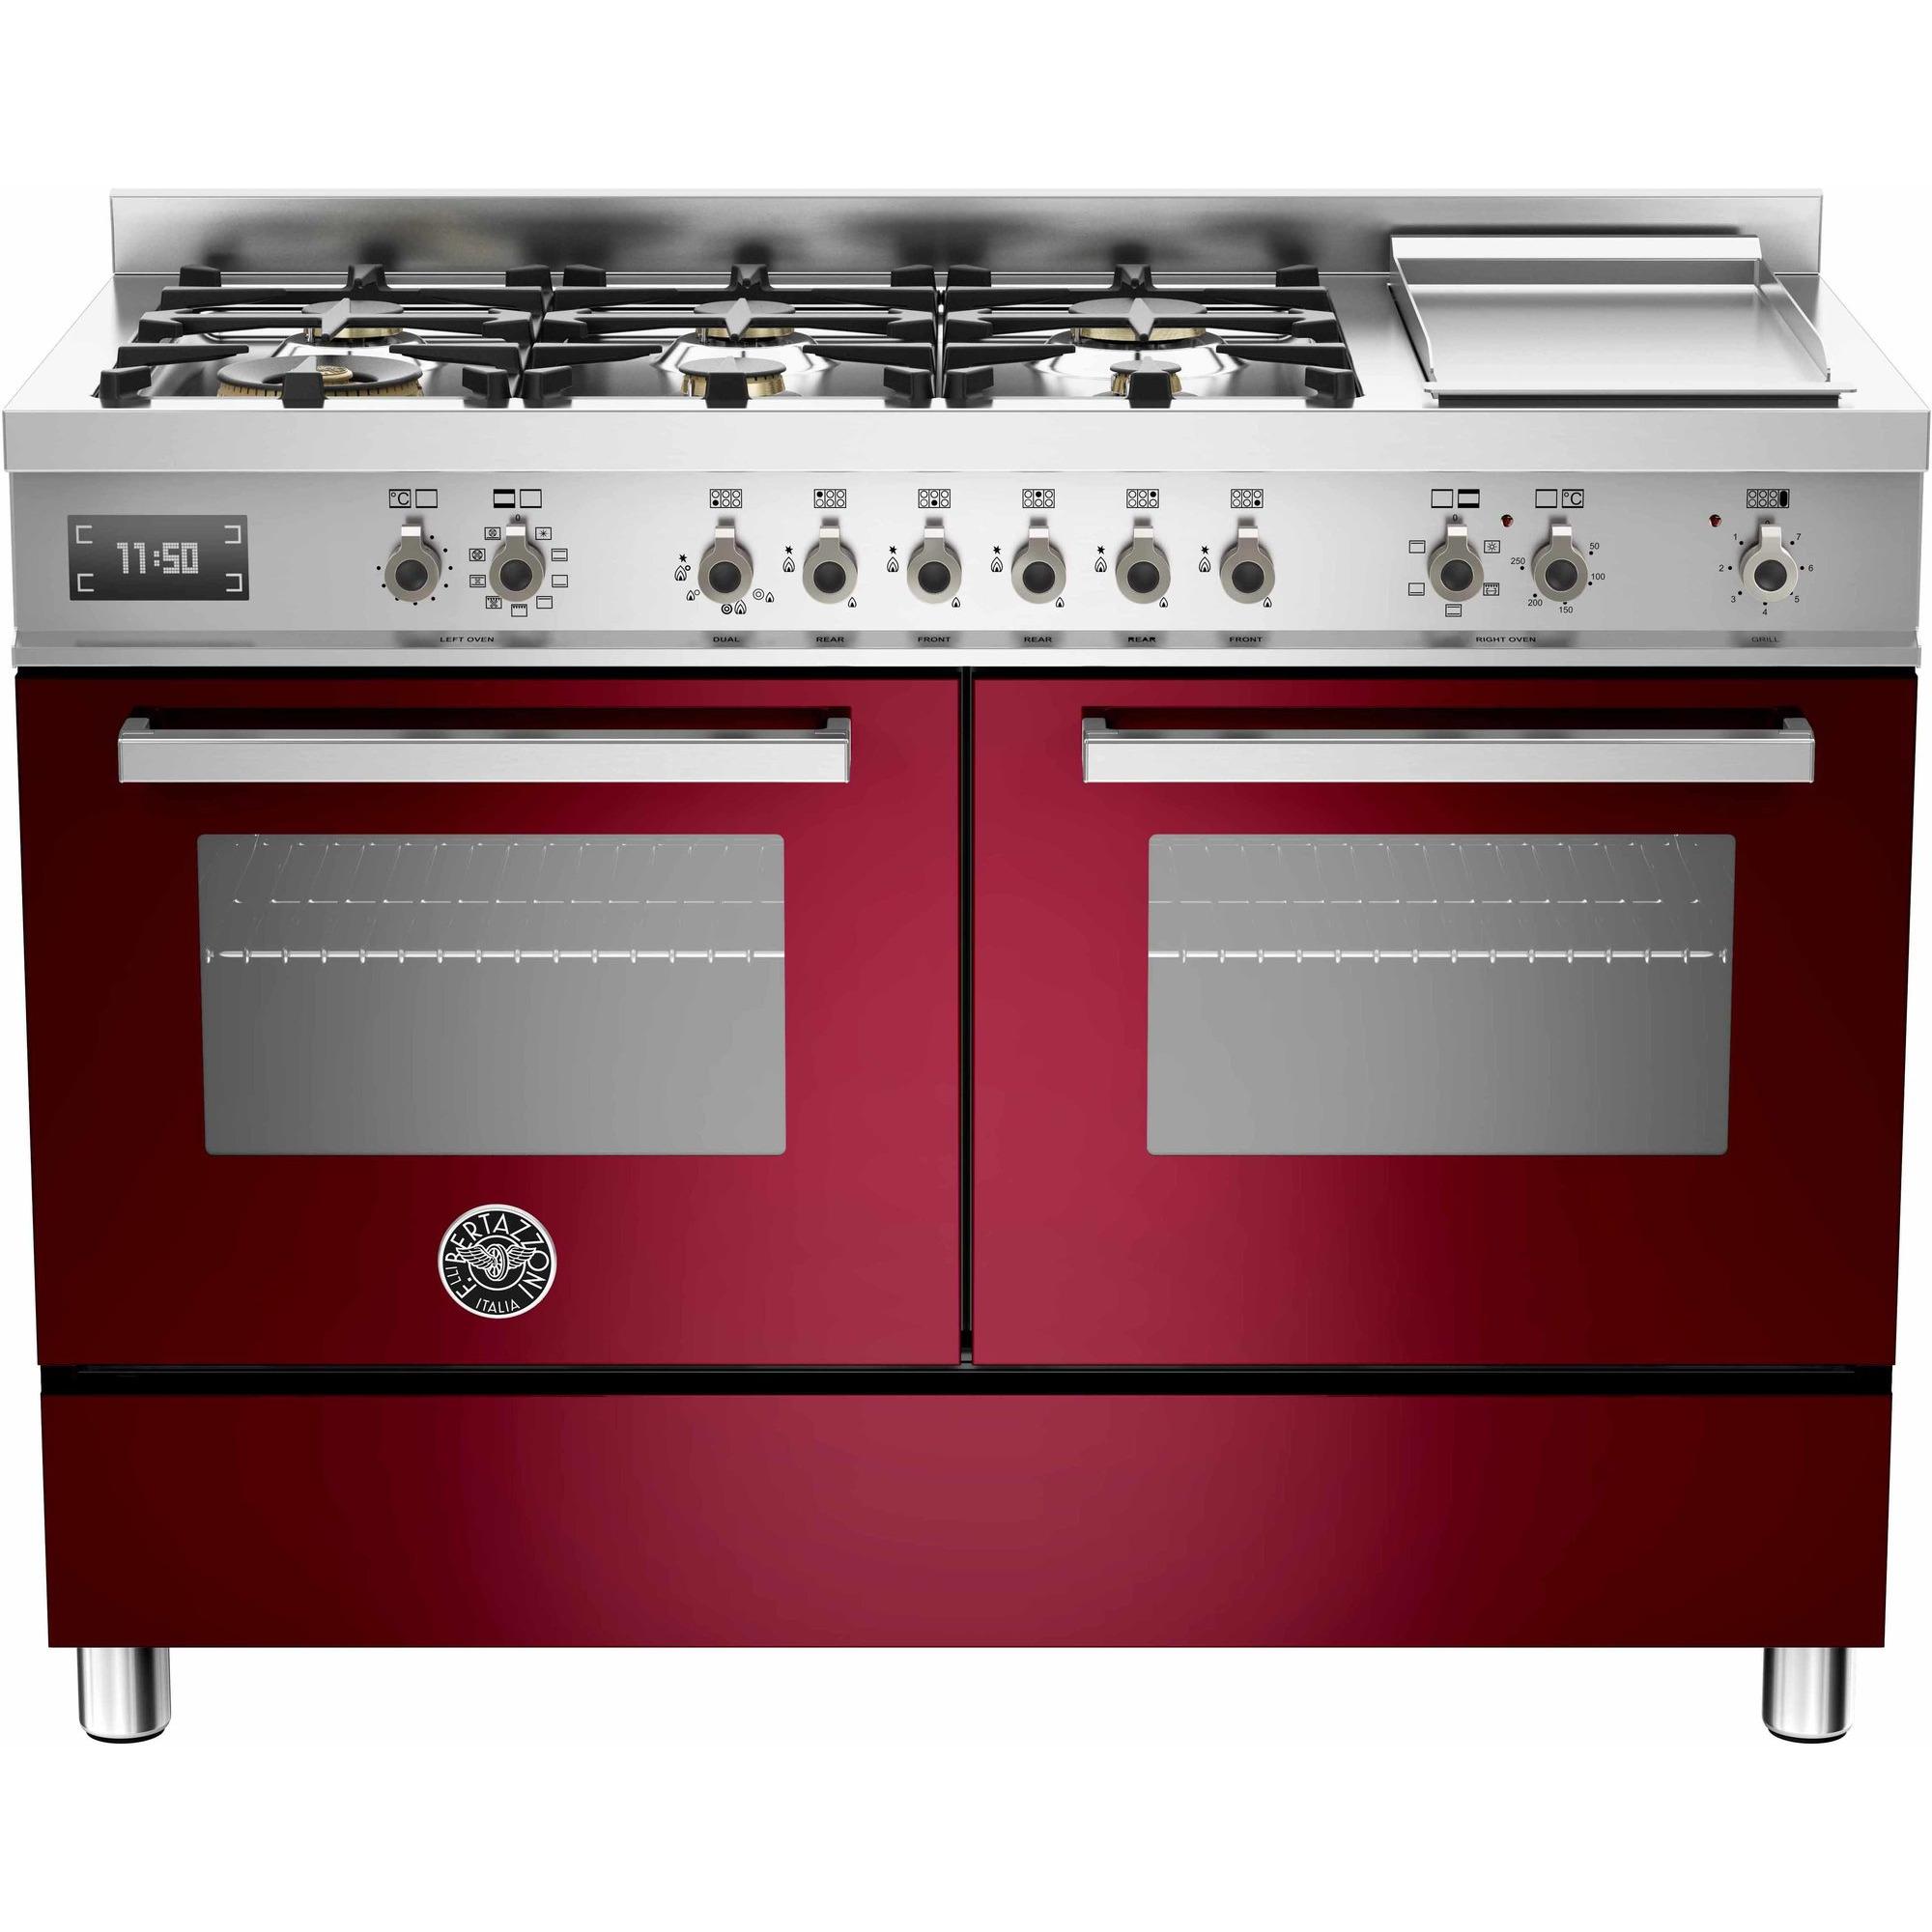 Bertazzoni PRO1206 Gasspis 120 cm 2 ugnar 6 brännare + elektrisk tepanyaki vinröd